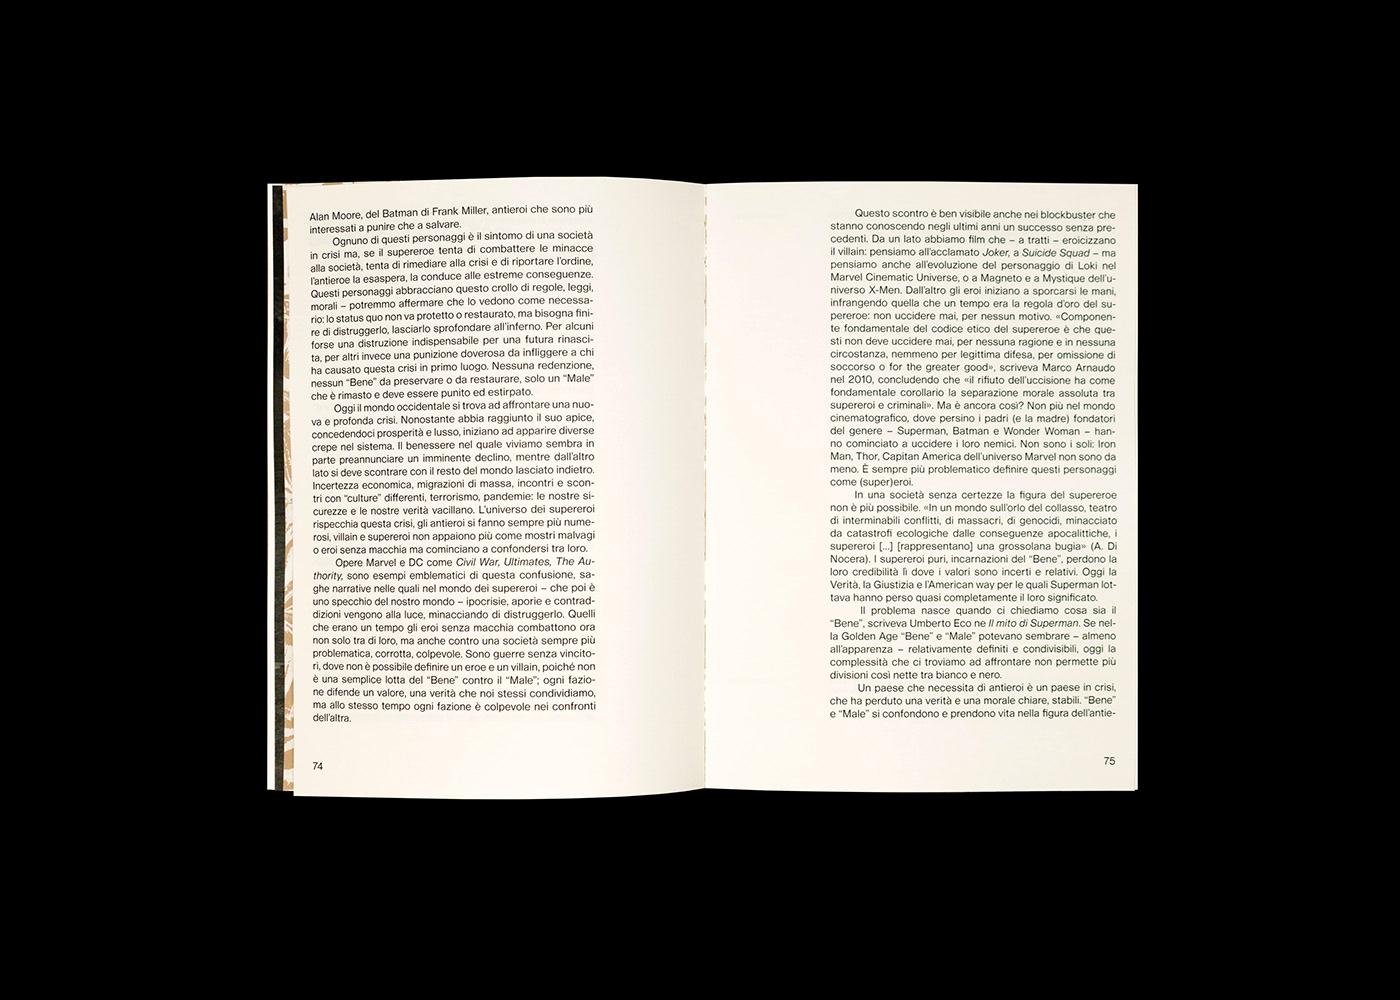 045 publishing binding dorso a vista editoria editorial design  favini rilegatura Selfpublishing sovracoperta verona